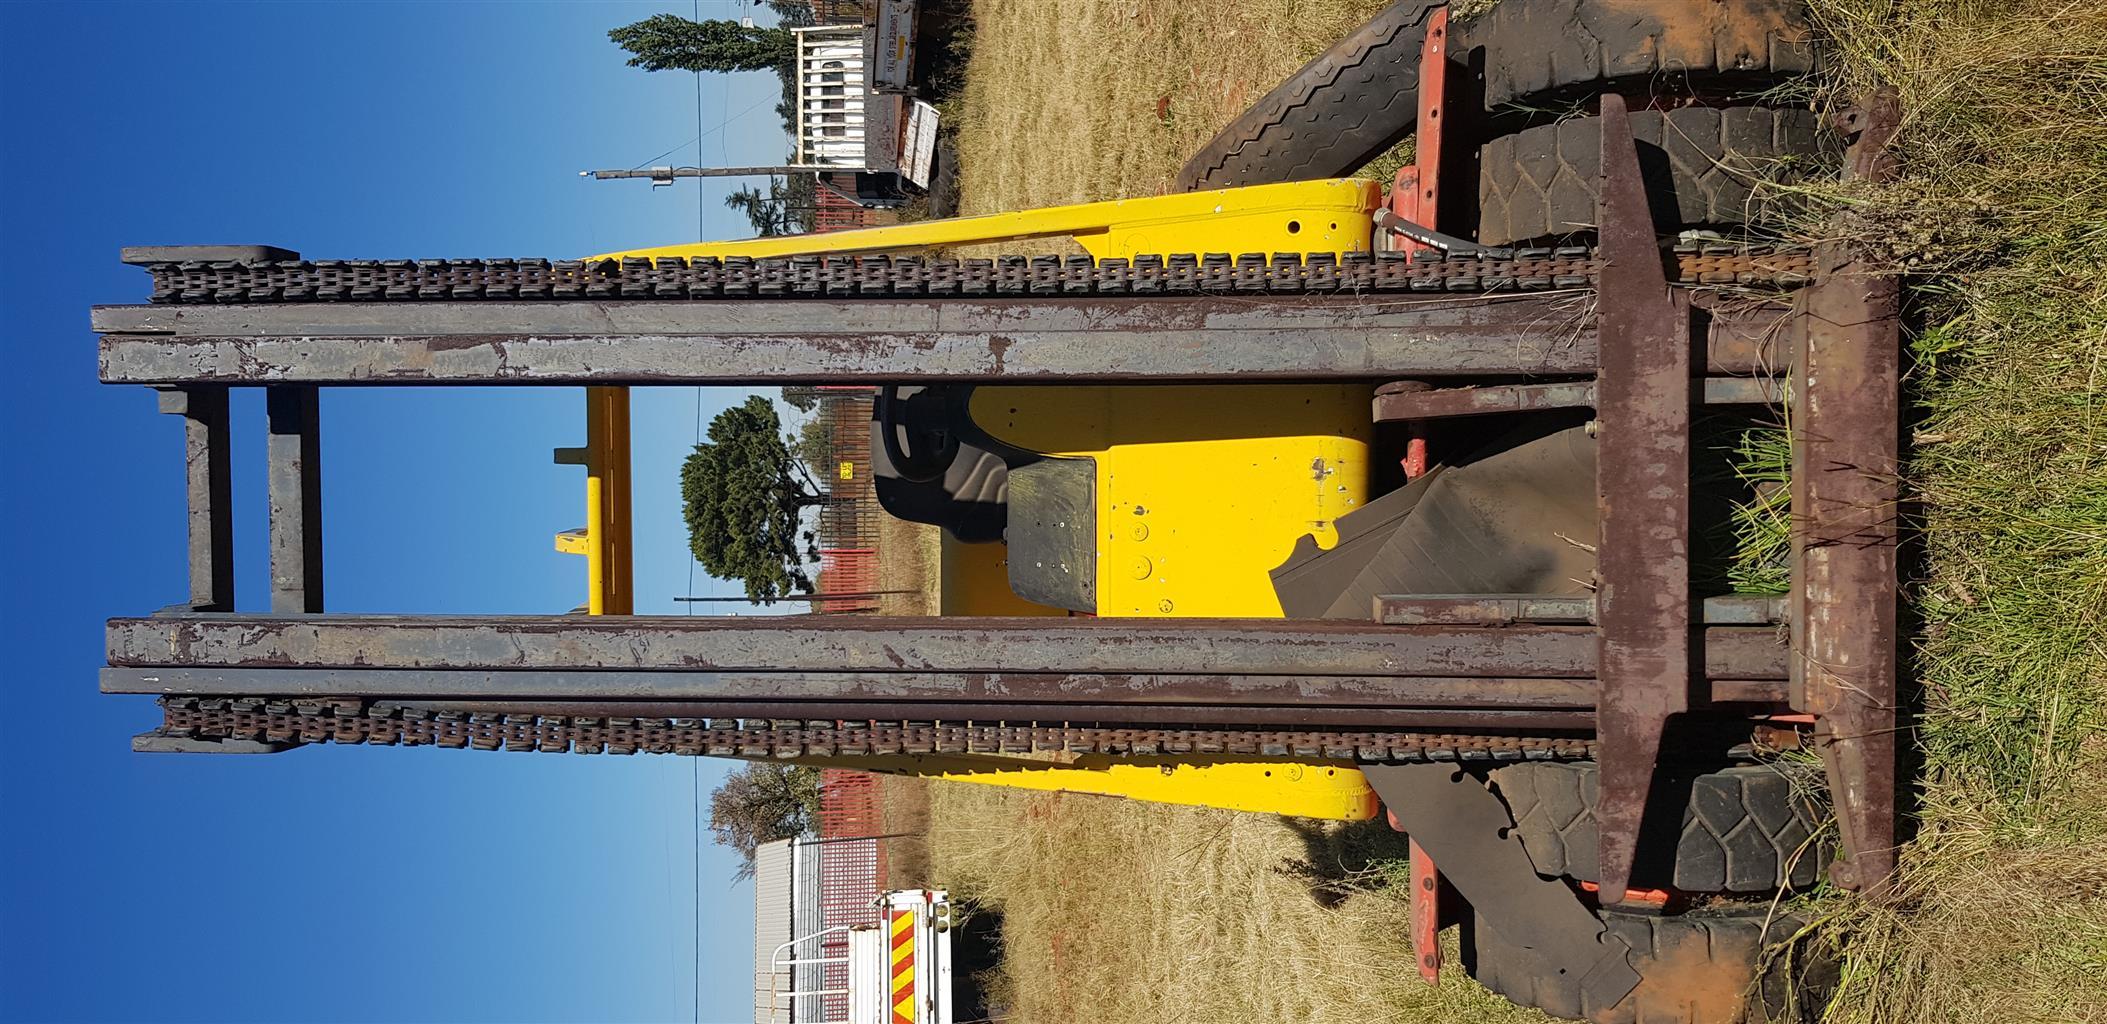 Forklift Linde All terrain 3 ton